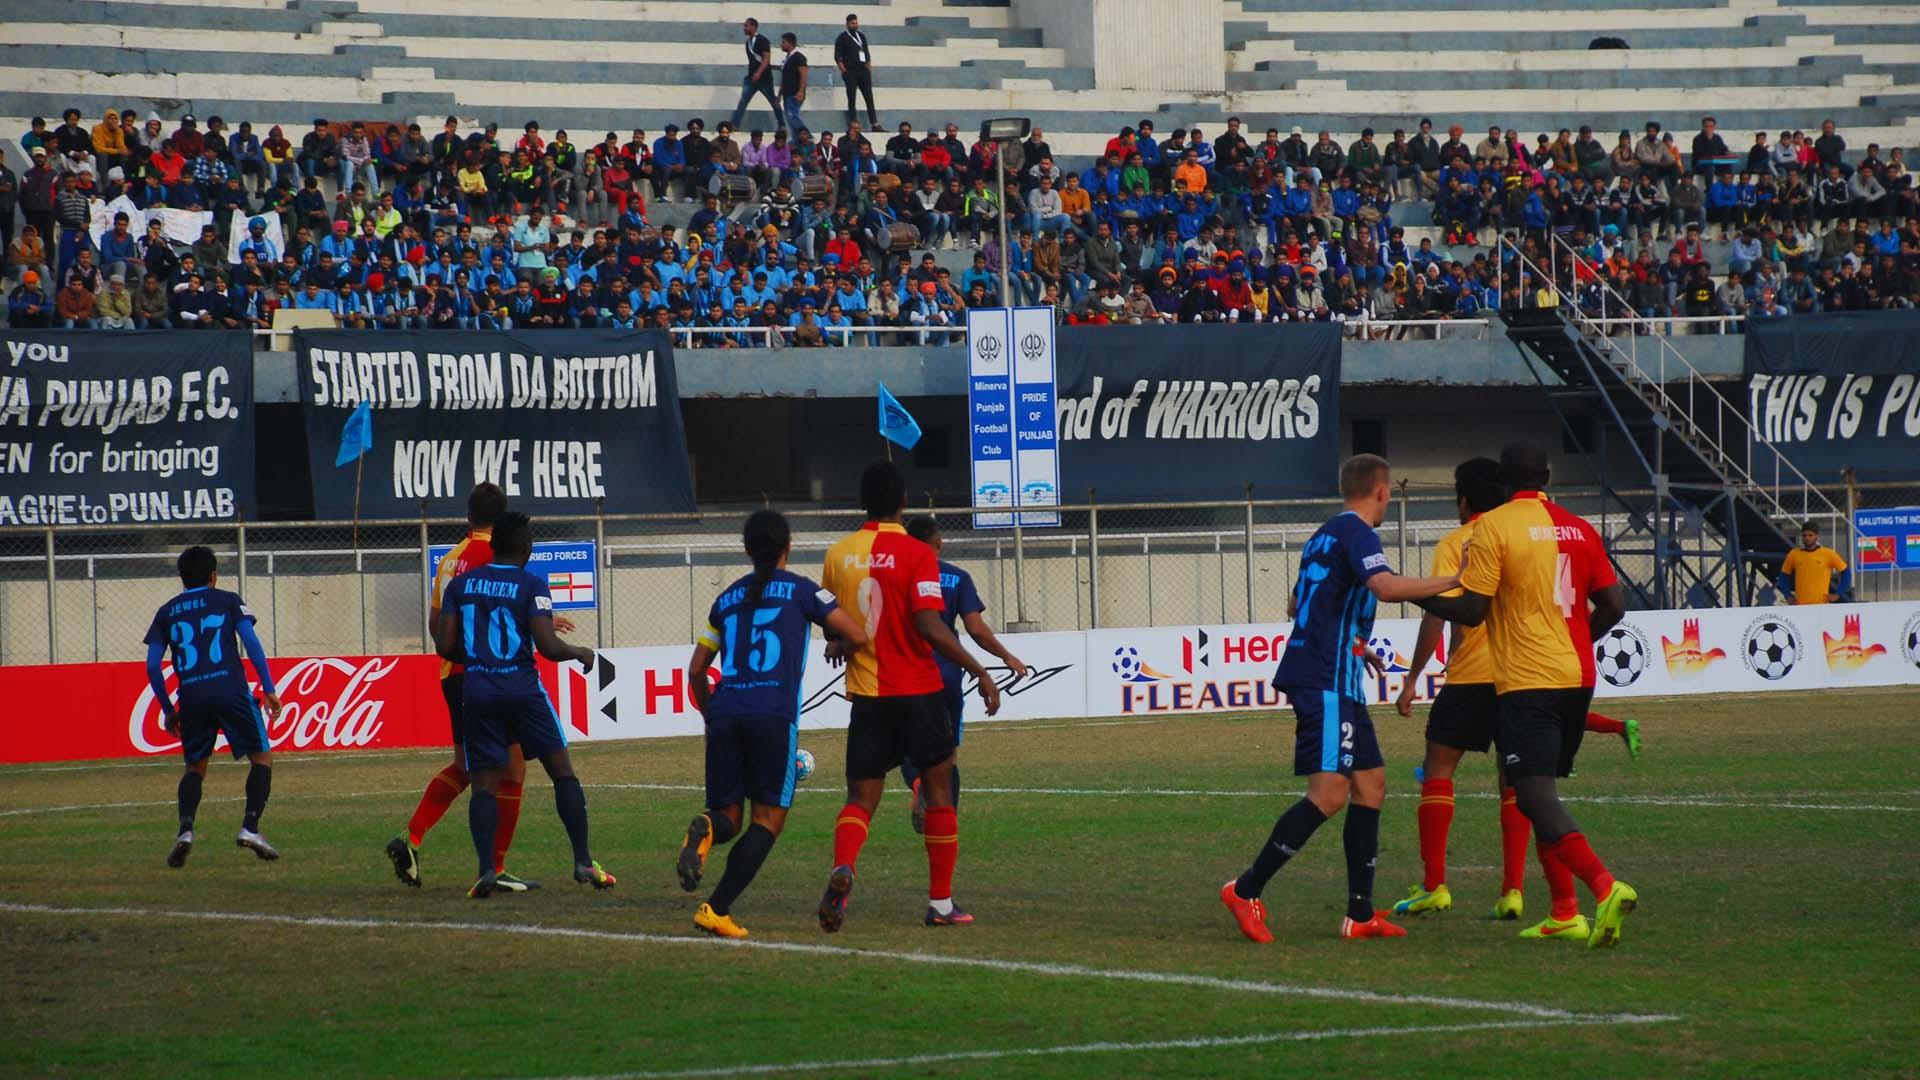 Minerva Punjab 0 - 5 East Bengal Match report - 29/01/17 I ...